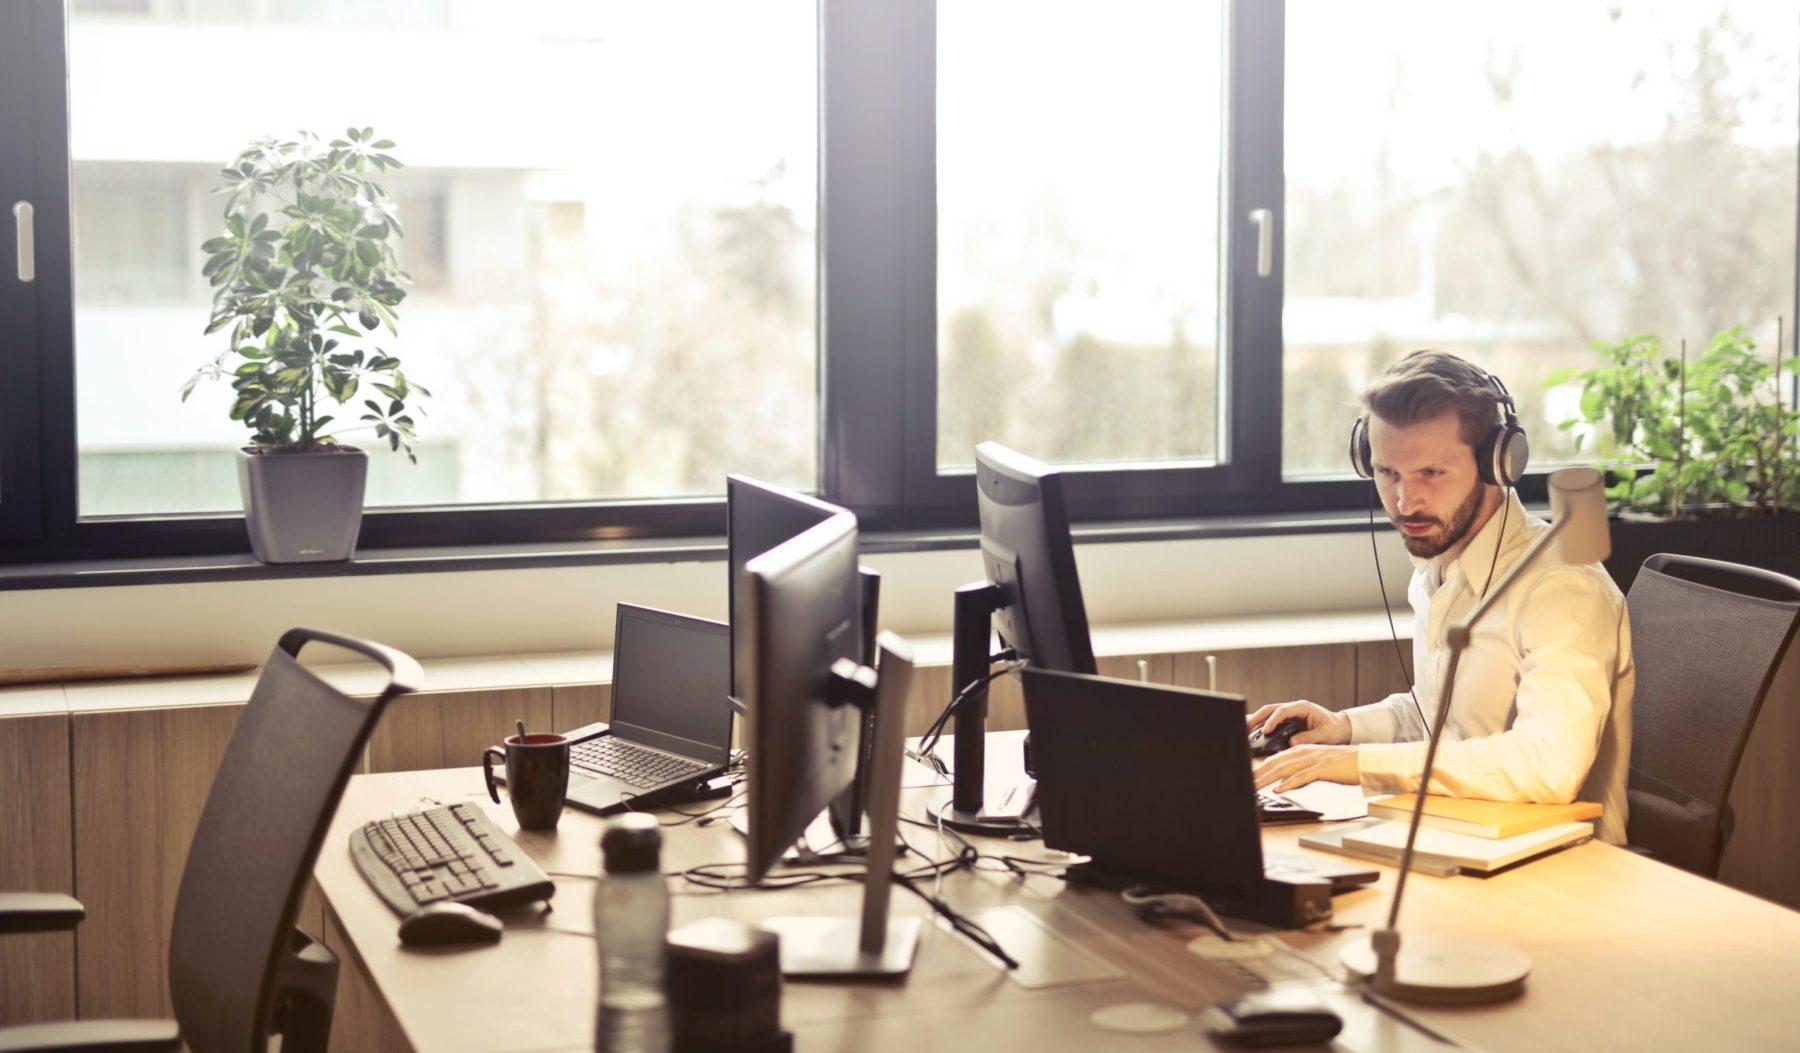 Image: listening to a webinar